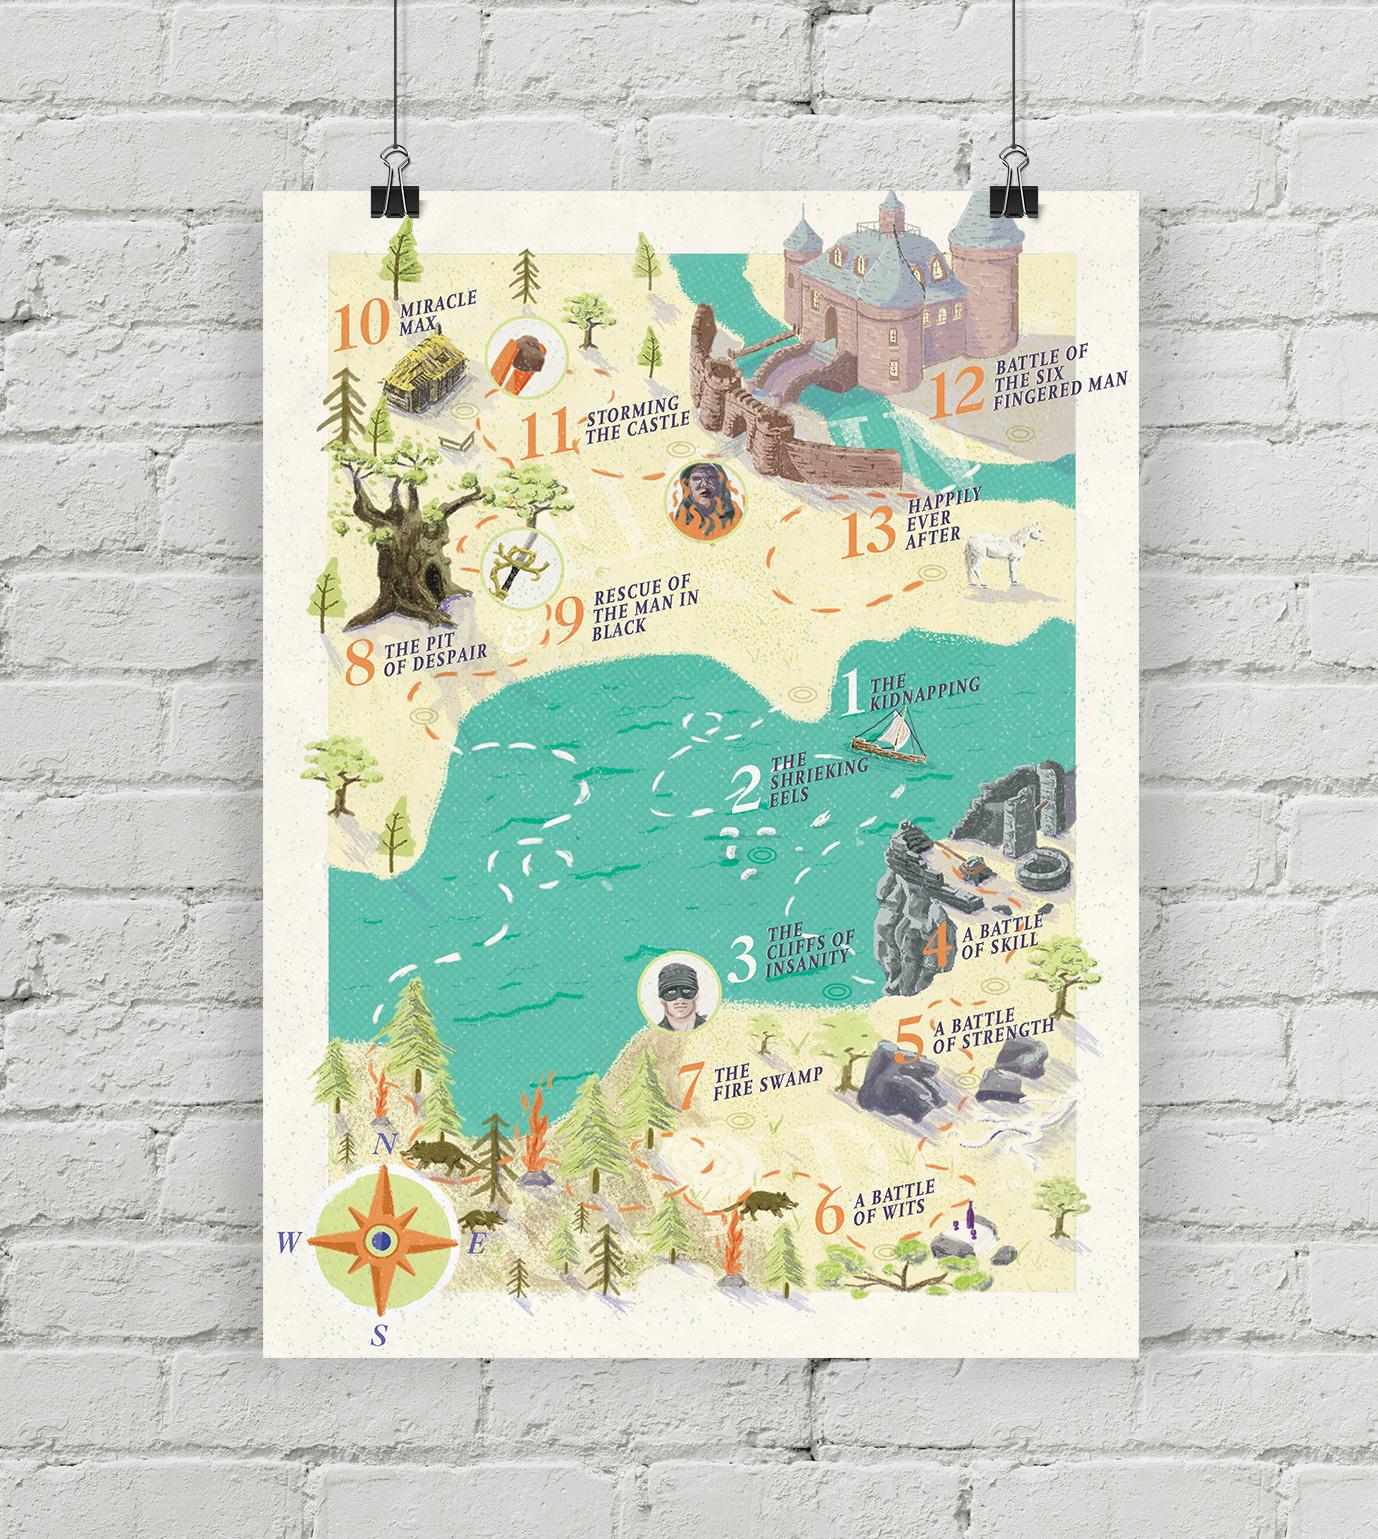 Illustrated companion guide for The Princess Bride